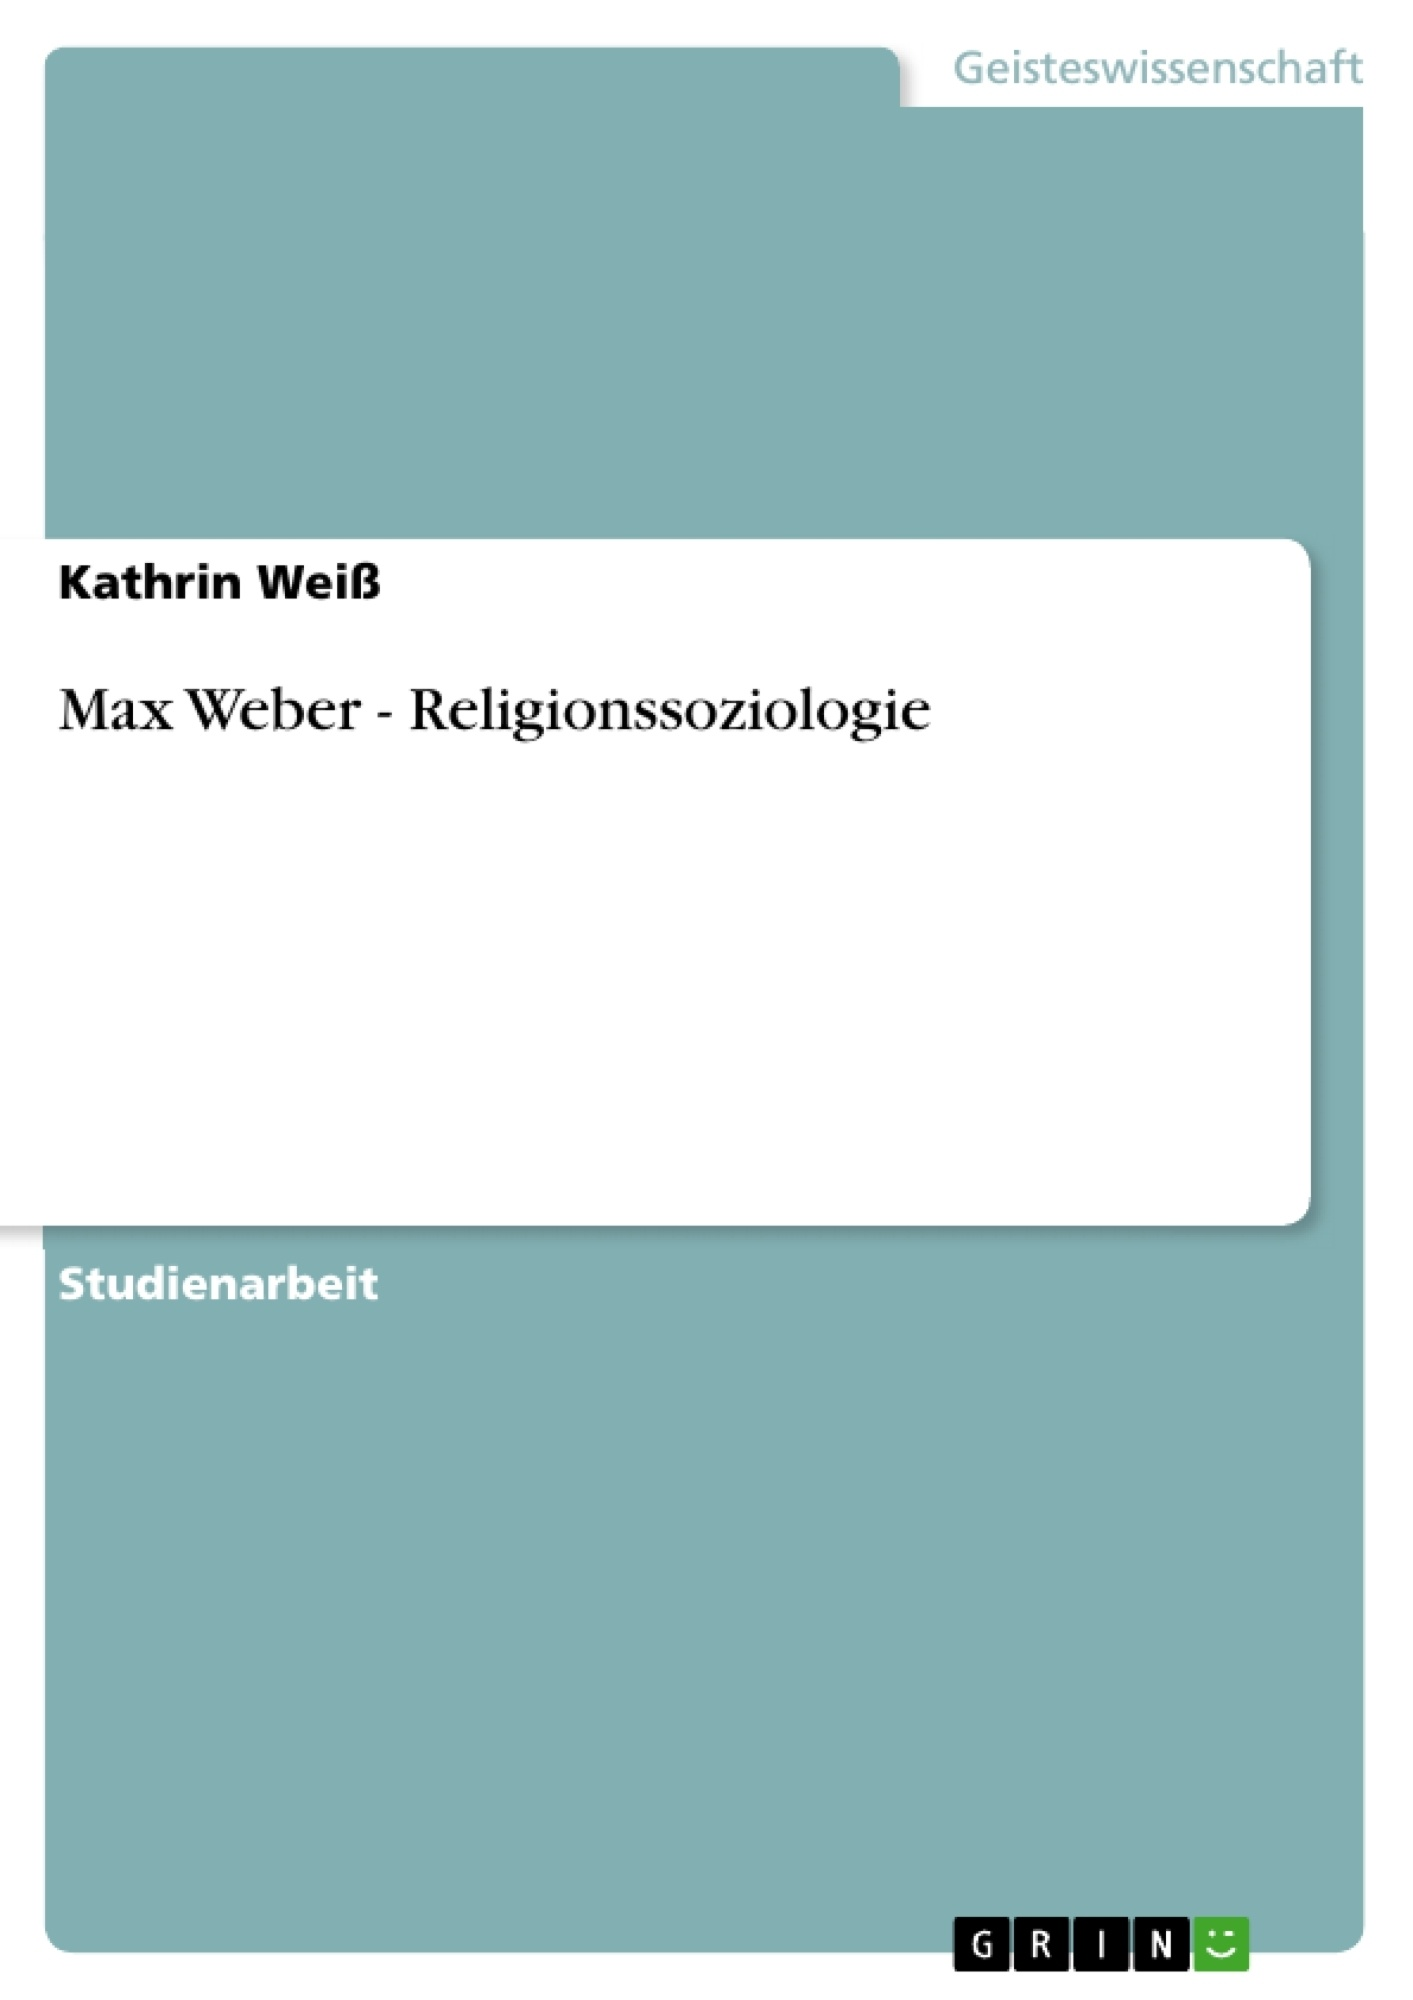 Titel: Max Weber - Religionssoziologie